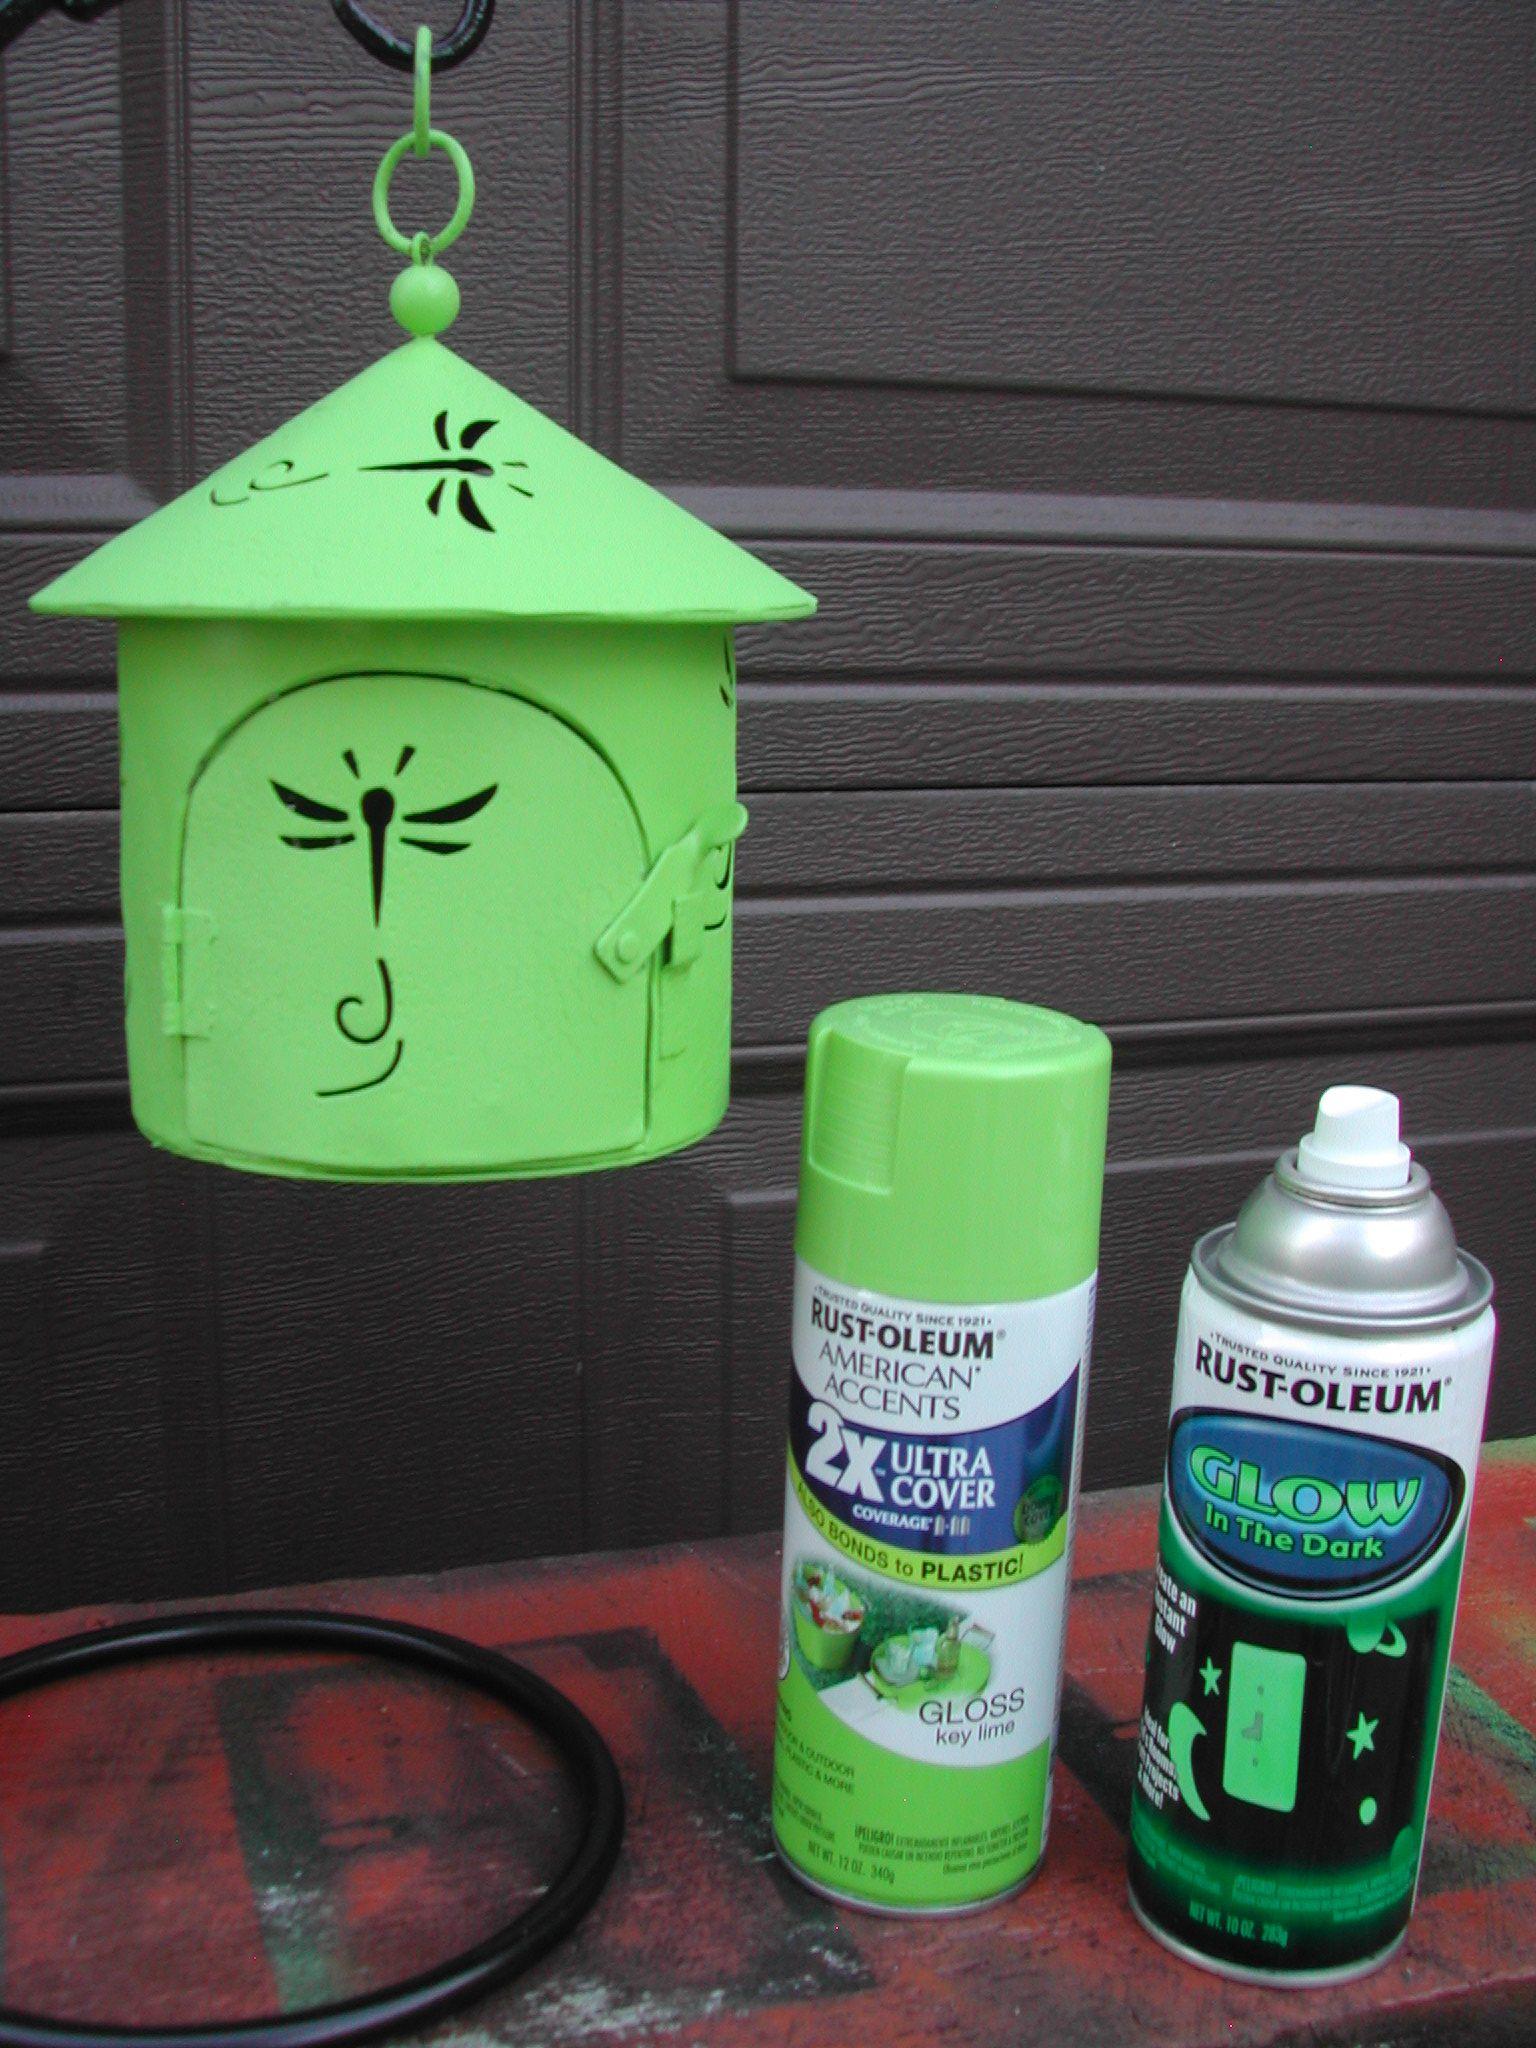 Dying Light Spray Paint : dying, light, spray, paint, Rust-oleum, Work,, Paint, First, Color, Glos…, Garden, Crafts, Backyard, Design,